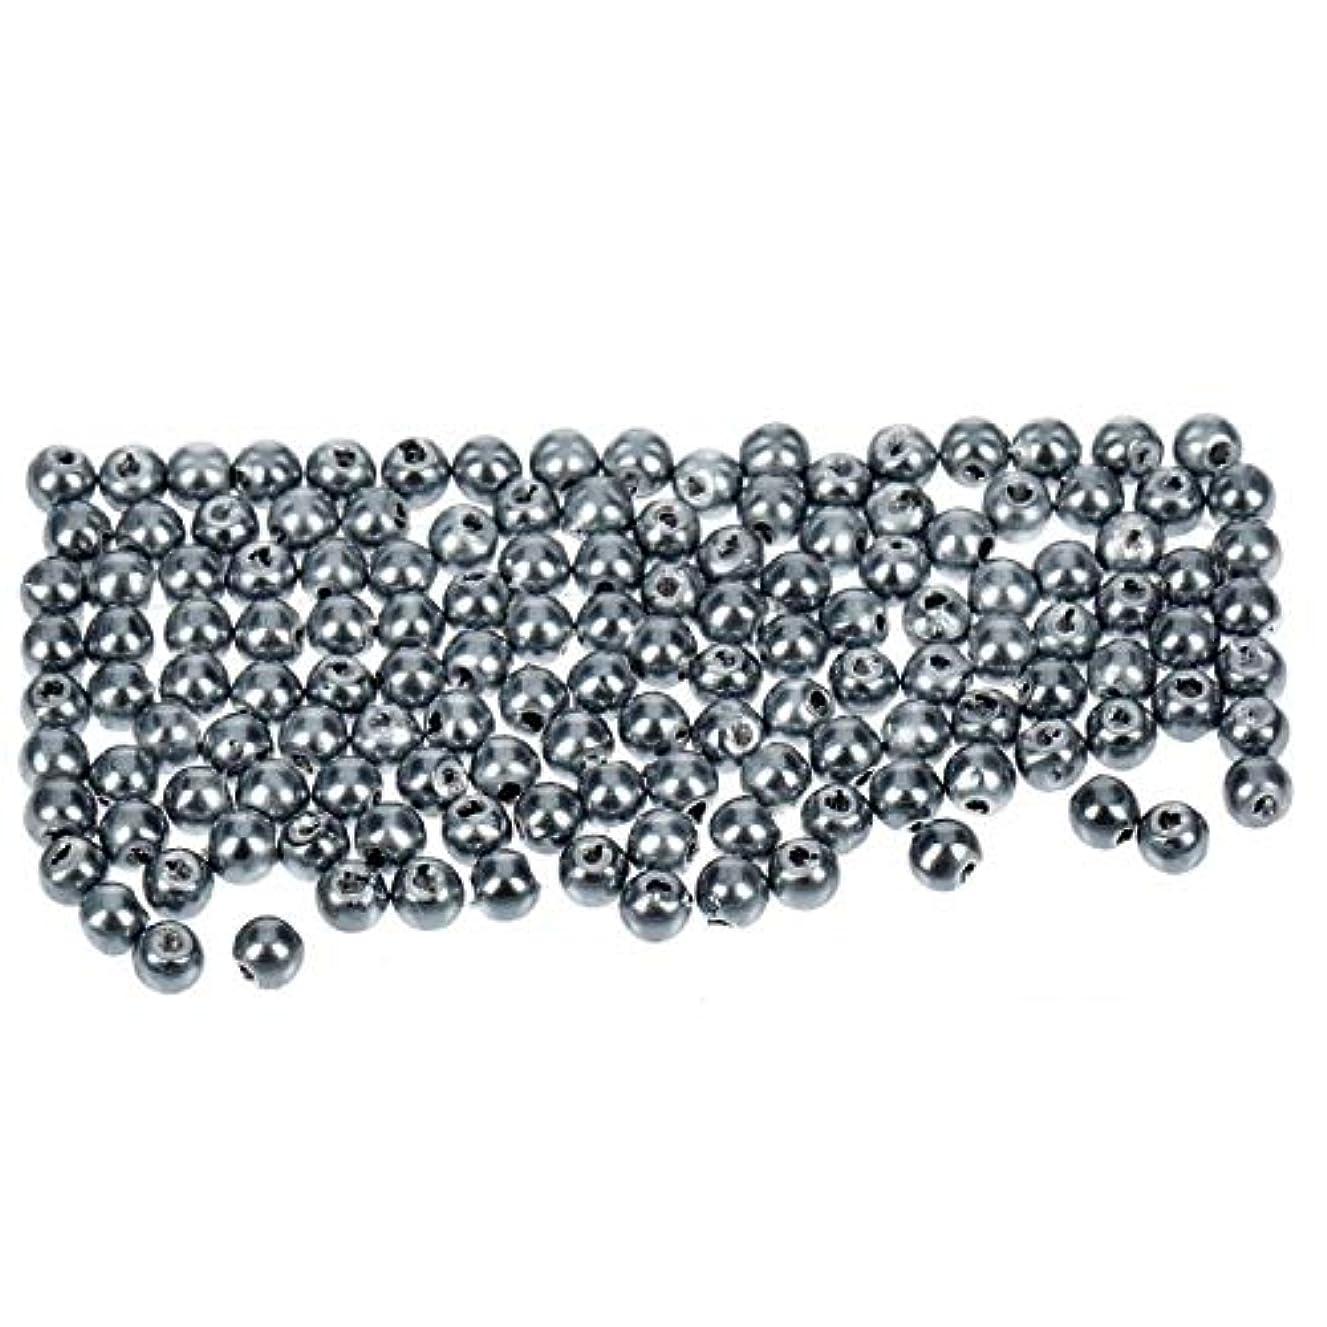 Efco Wax Beads, Plastic, Anthracite, 3 mm Diameter, 125-Piece